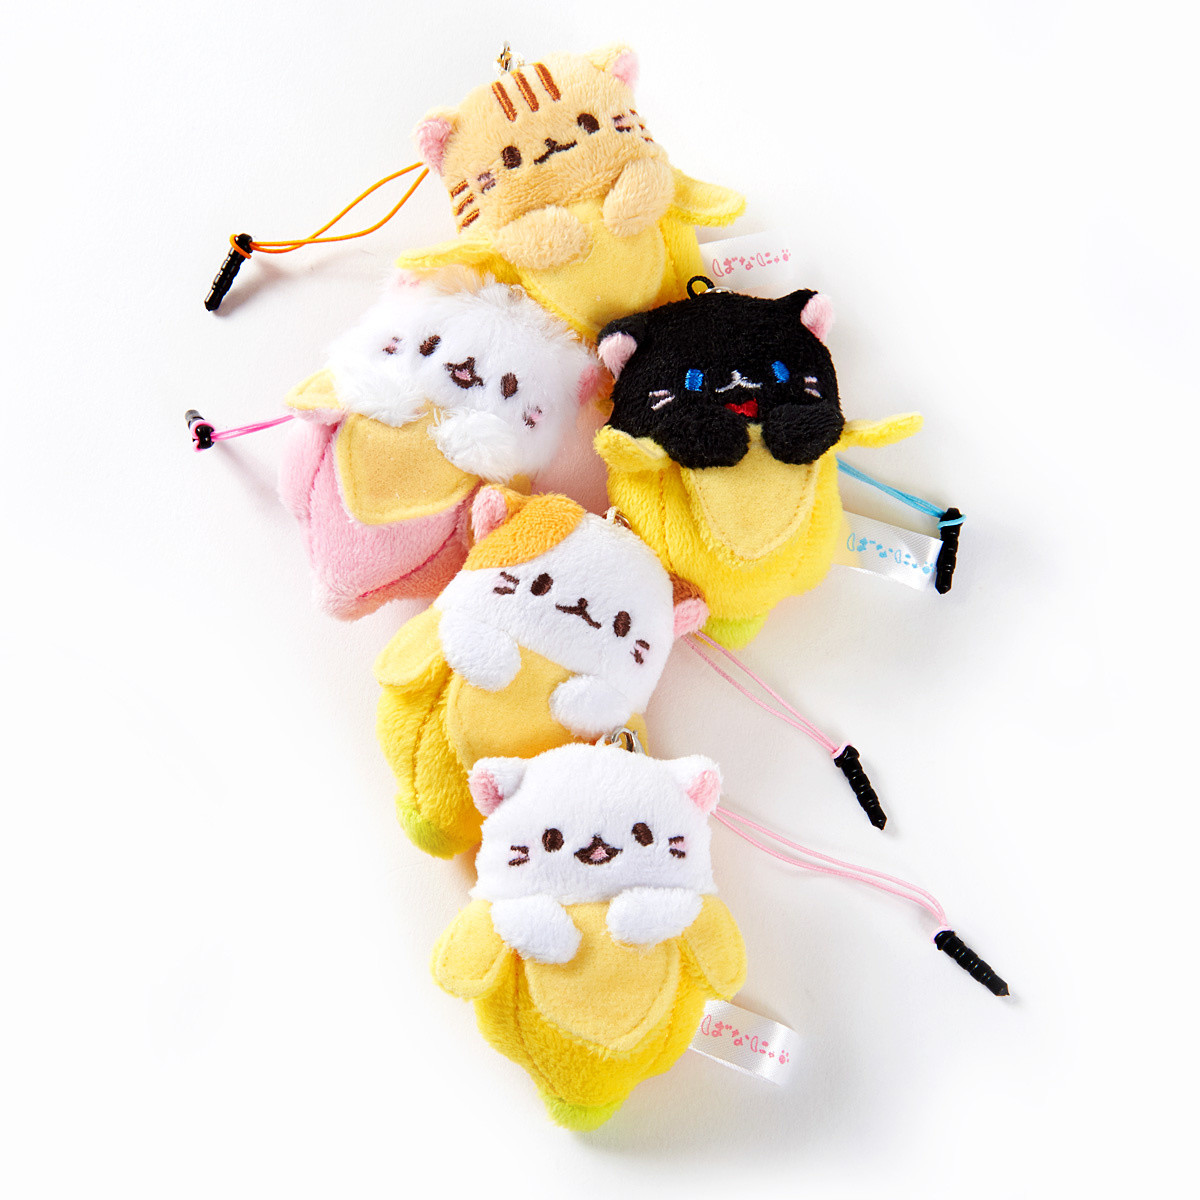 Bananya 4/'/' Kuro Bananya Plush Key Chain Anime Manga NEW